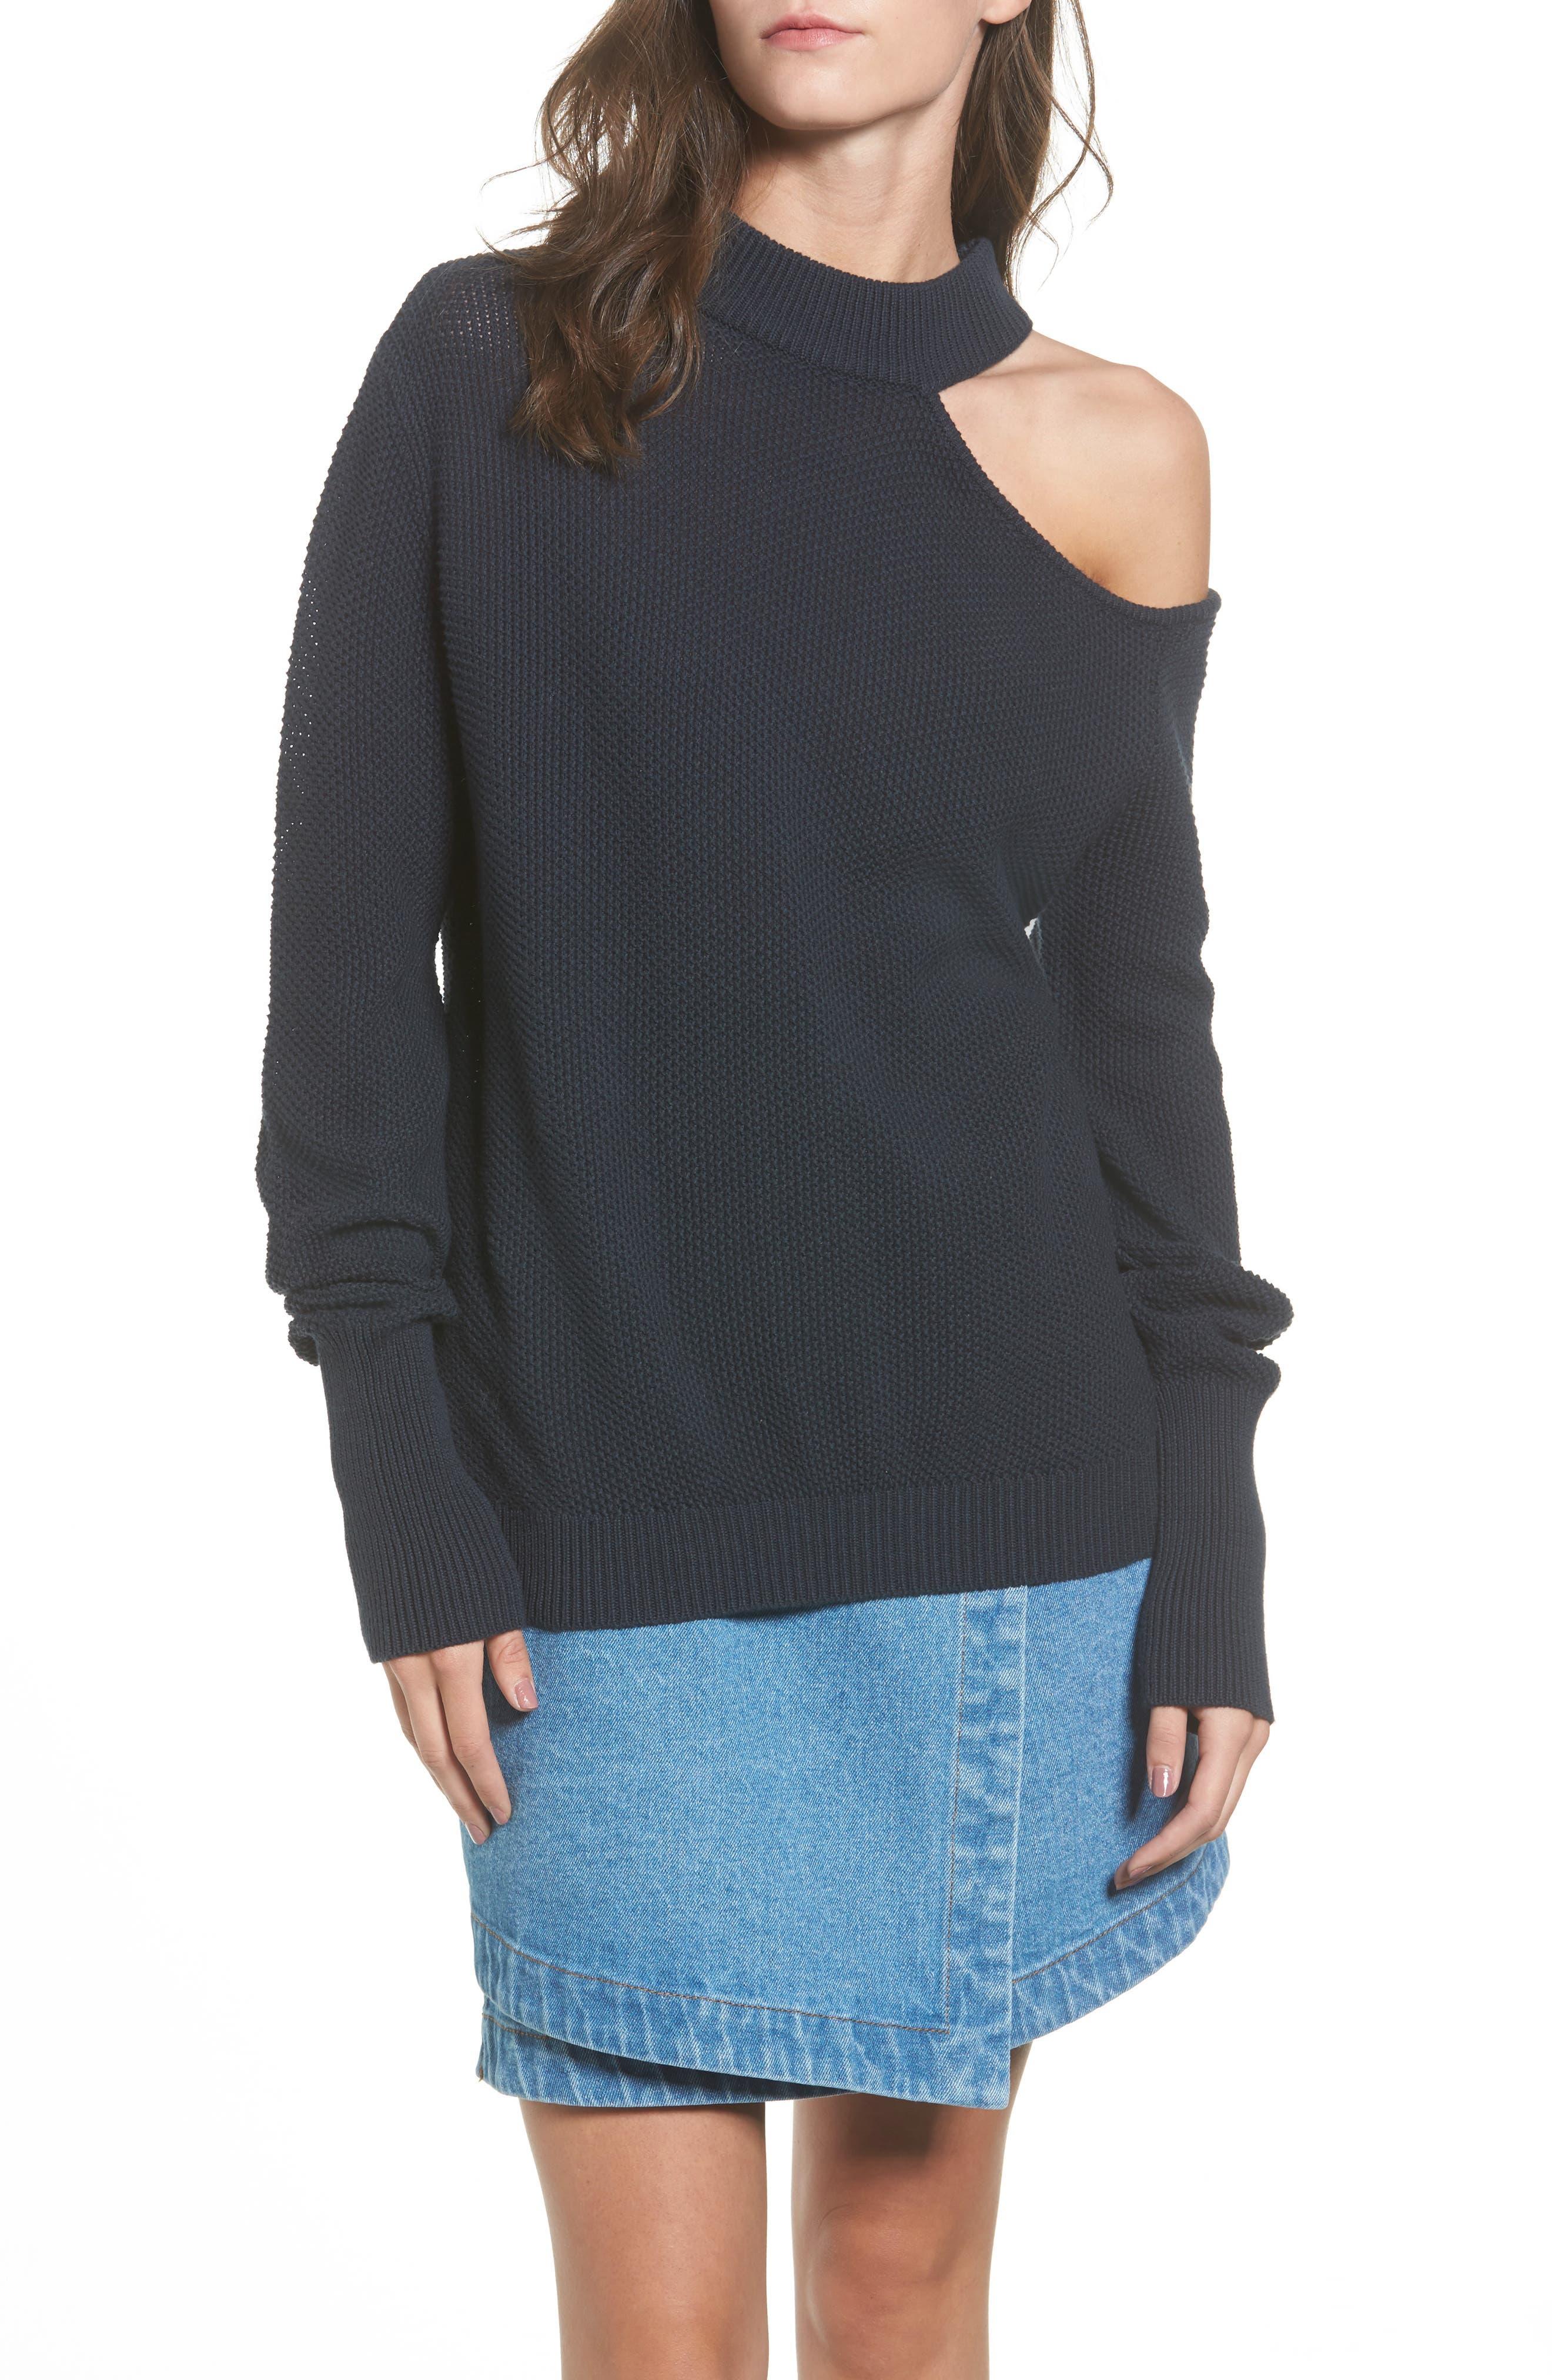 The Fifth Label Impression Cold-Shoulder Sweater